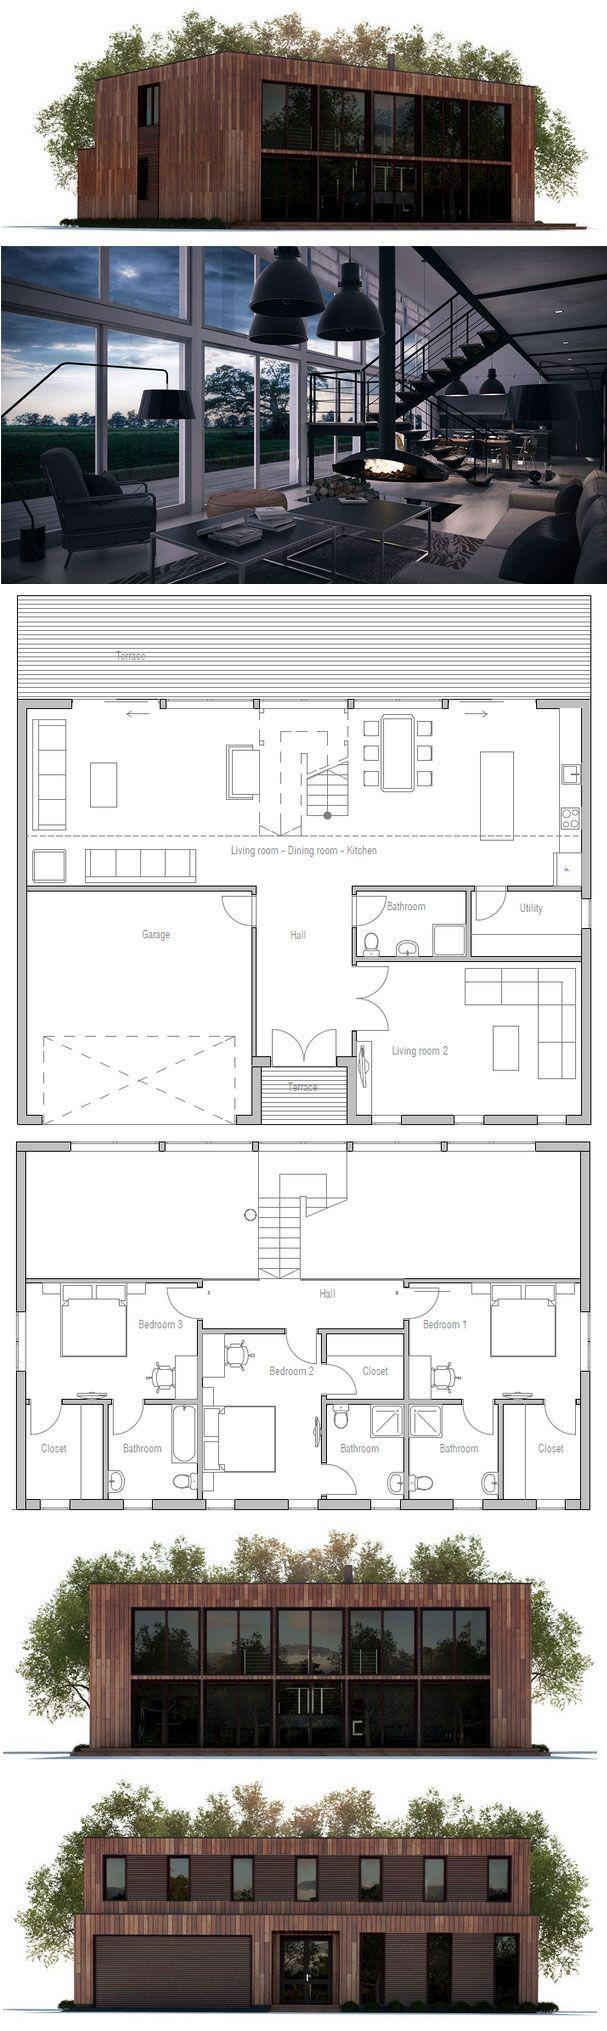 17 best ideas about open floor plans on pinterest open for Best spec house plans